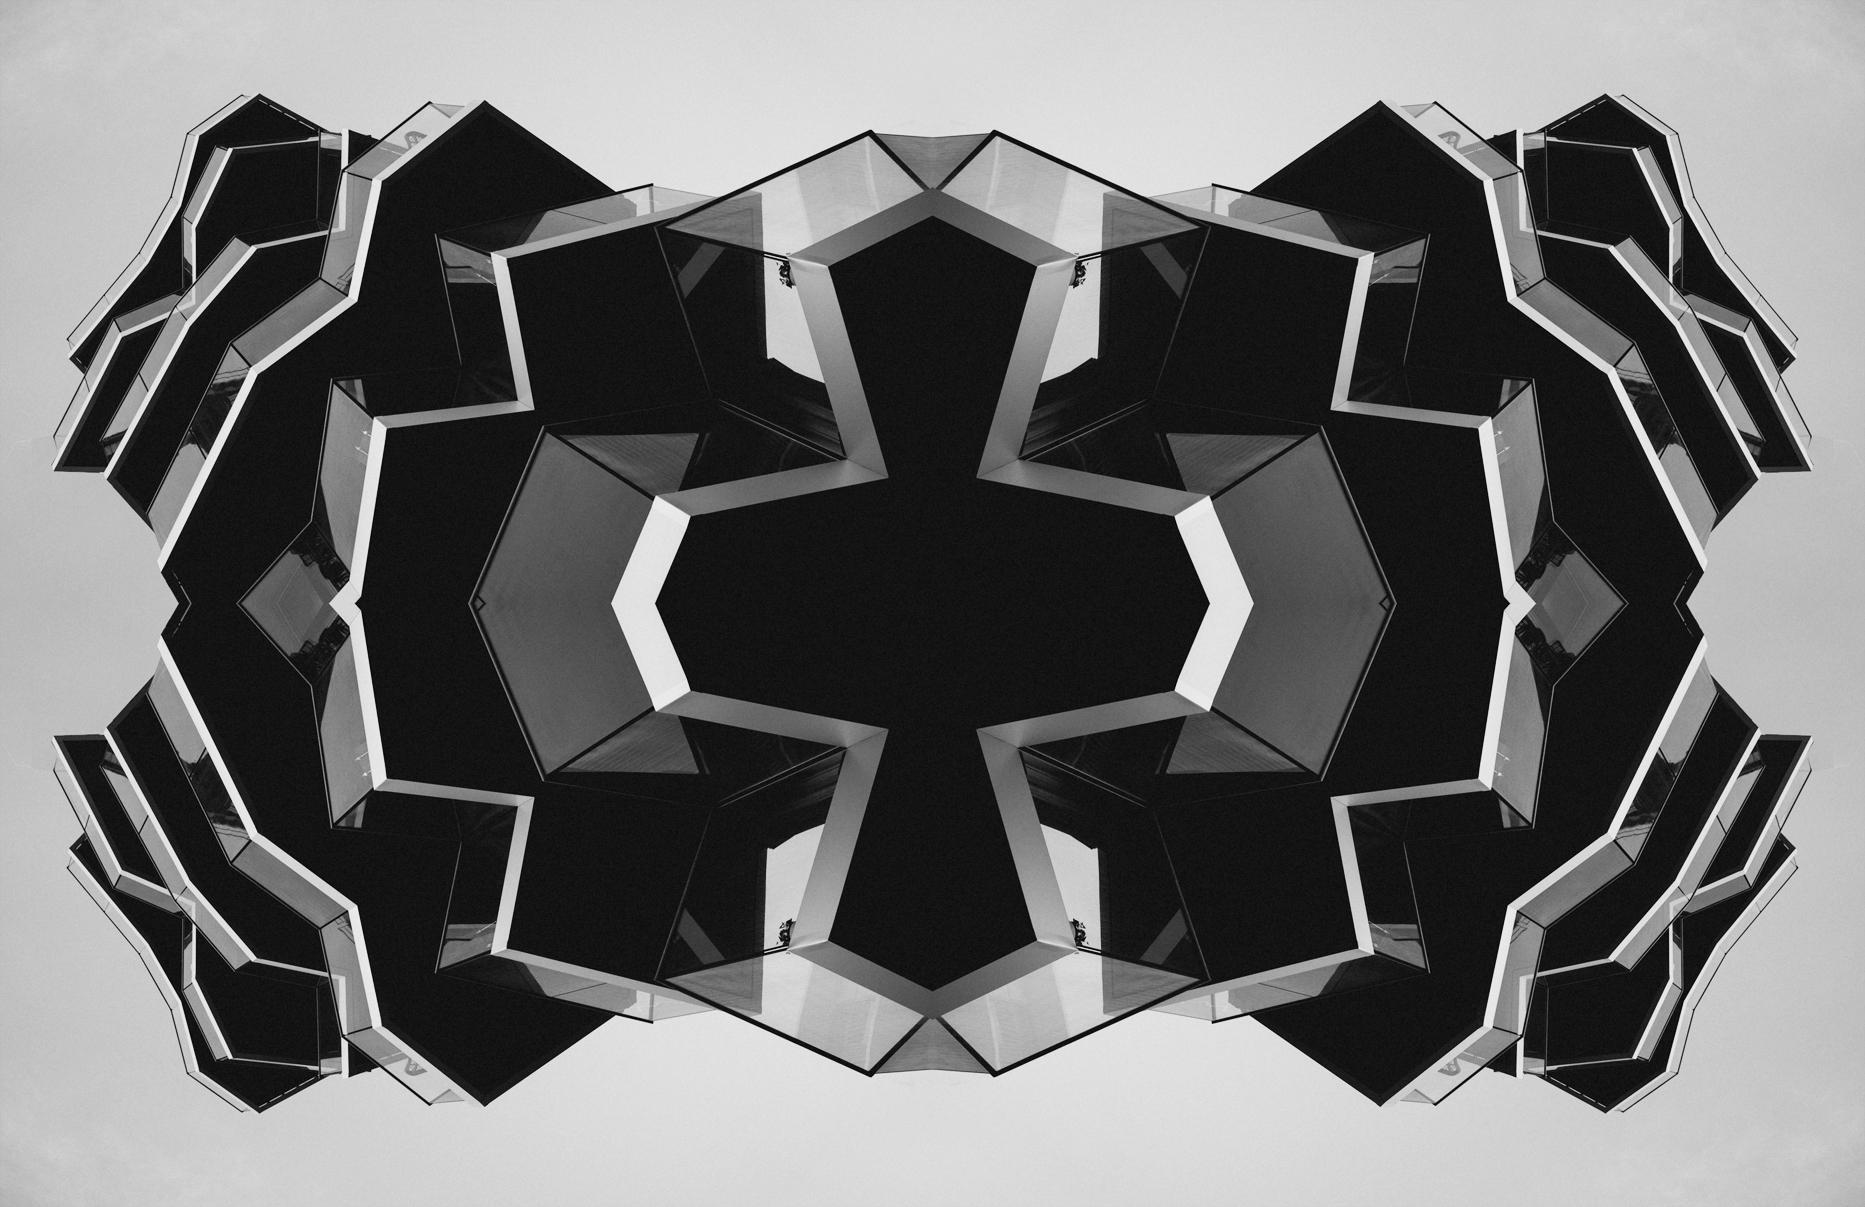 Day 198 – Friday July 18 – Abstract Tjuvholmen